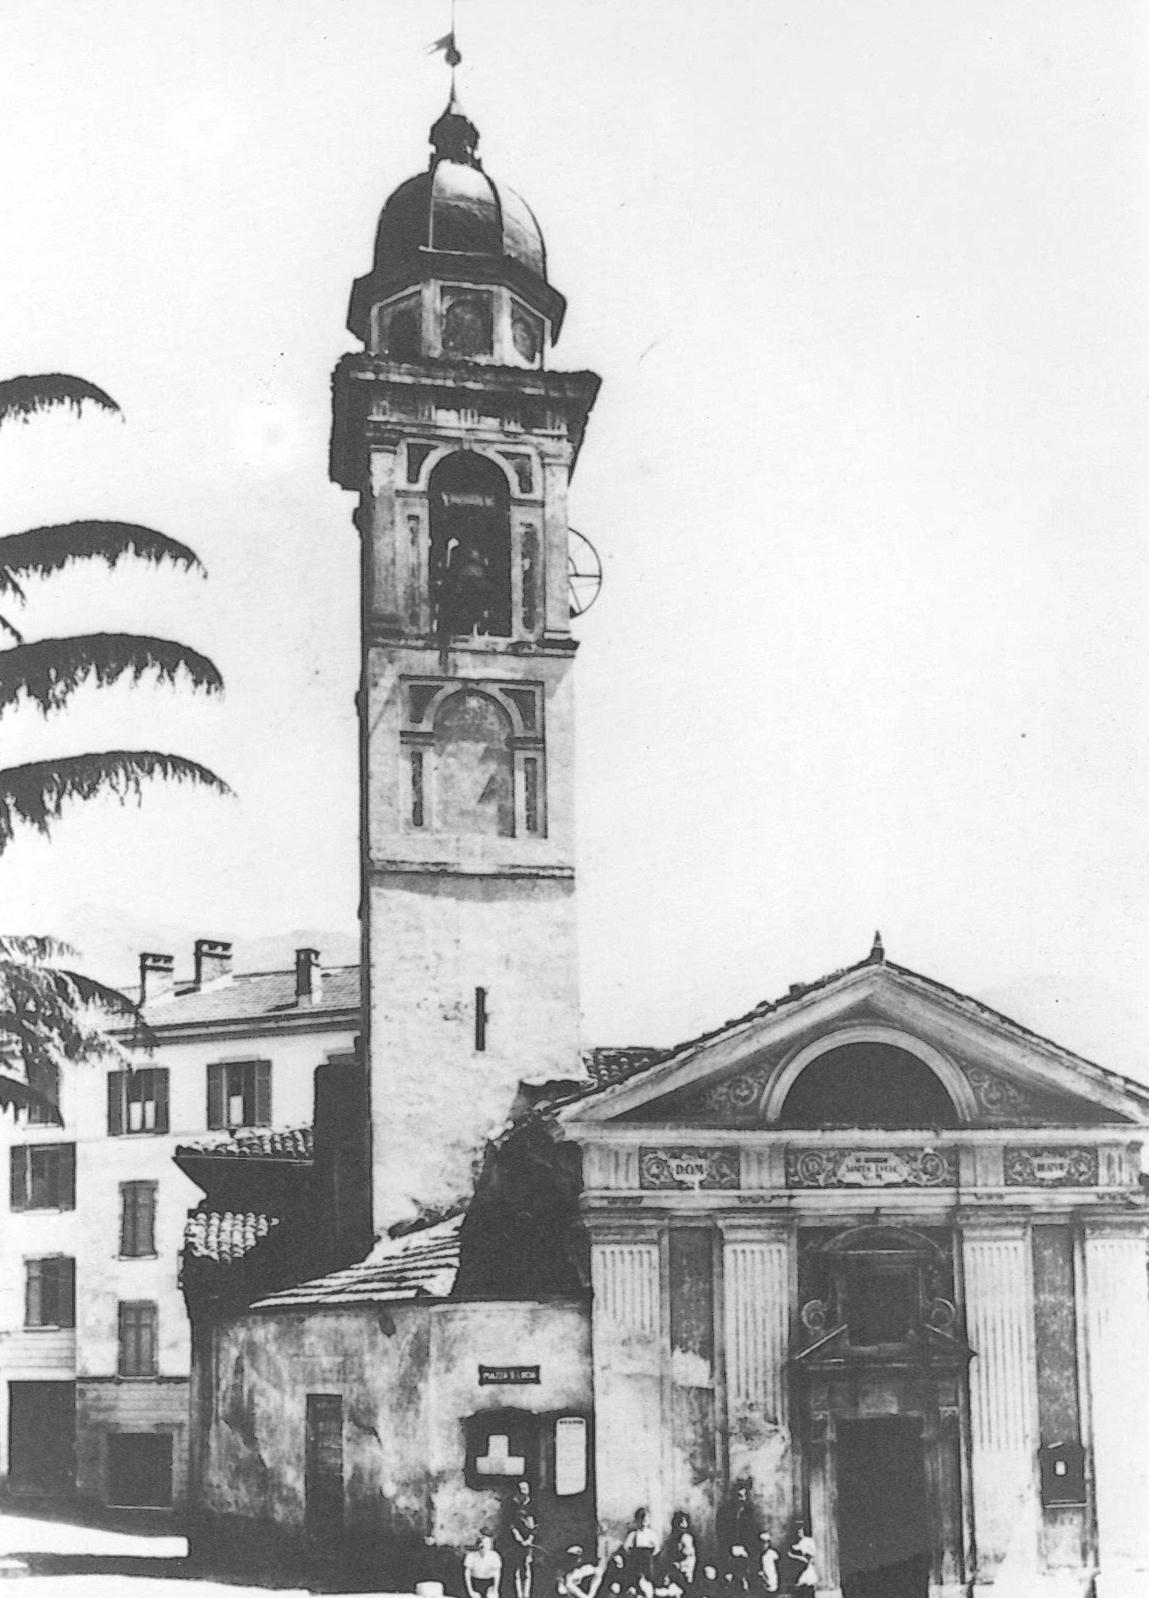 la vecchia chiesa parrocchiale